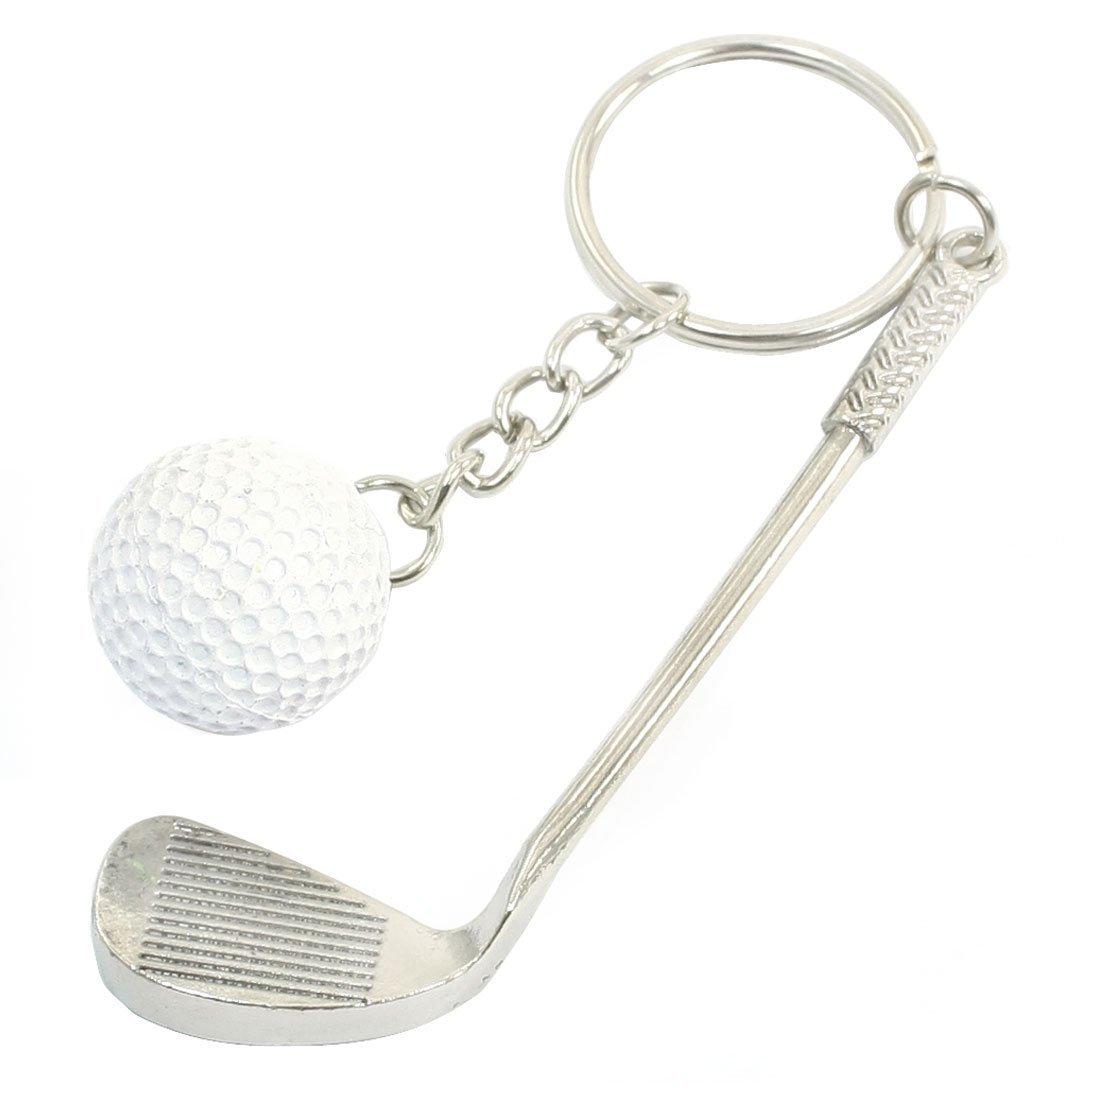 SODIAL(R) White Round Ball Golf Stick Decor Split Ring Keychain Silver Tone